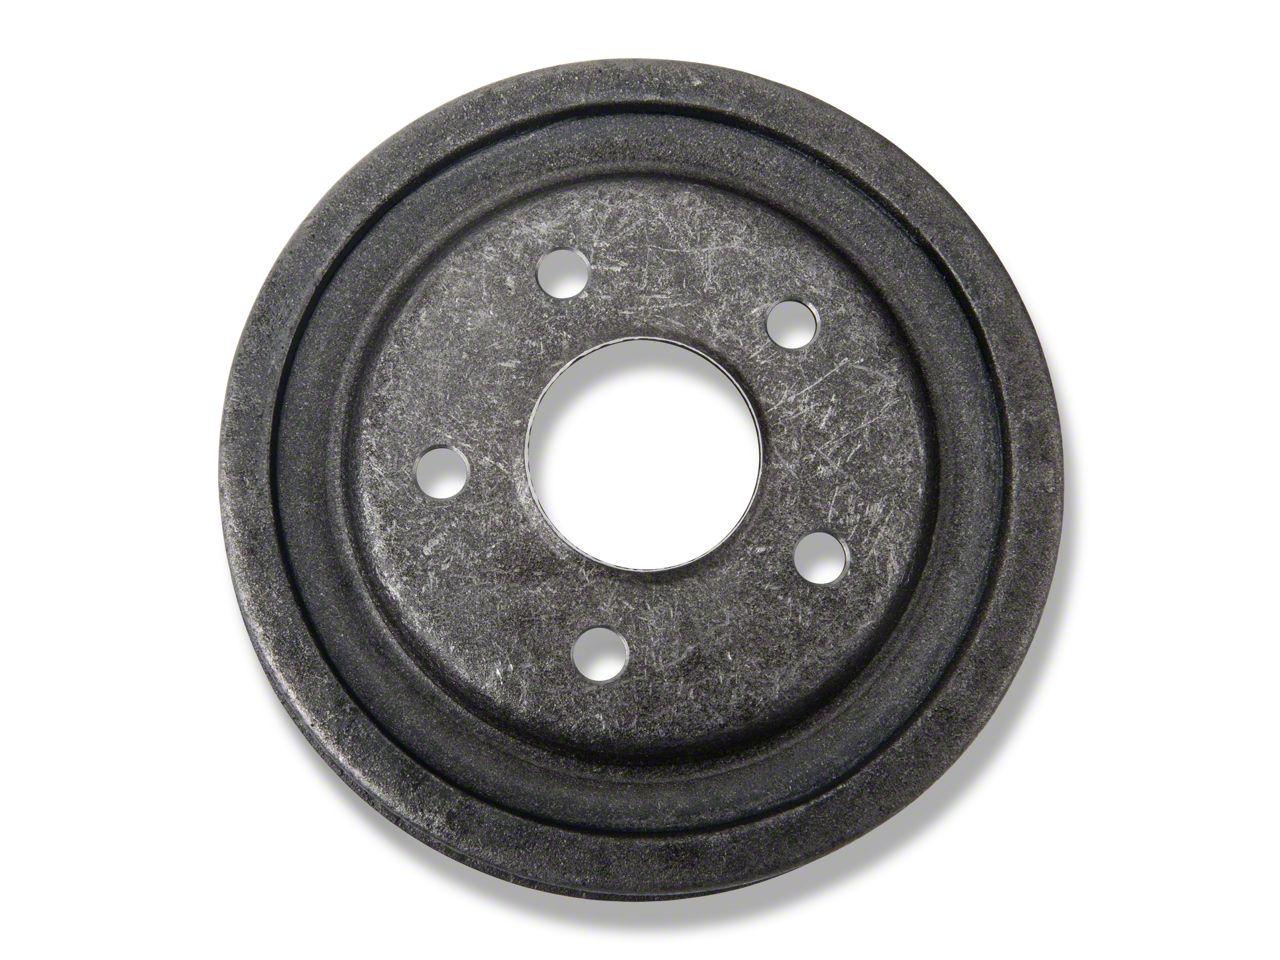 OPR Replacement Rear Drum - 5 Lug (79-93 w/ 5 Lug Conversion)